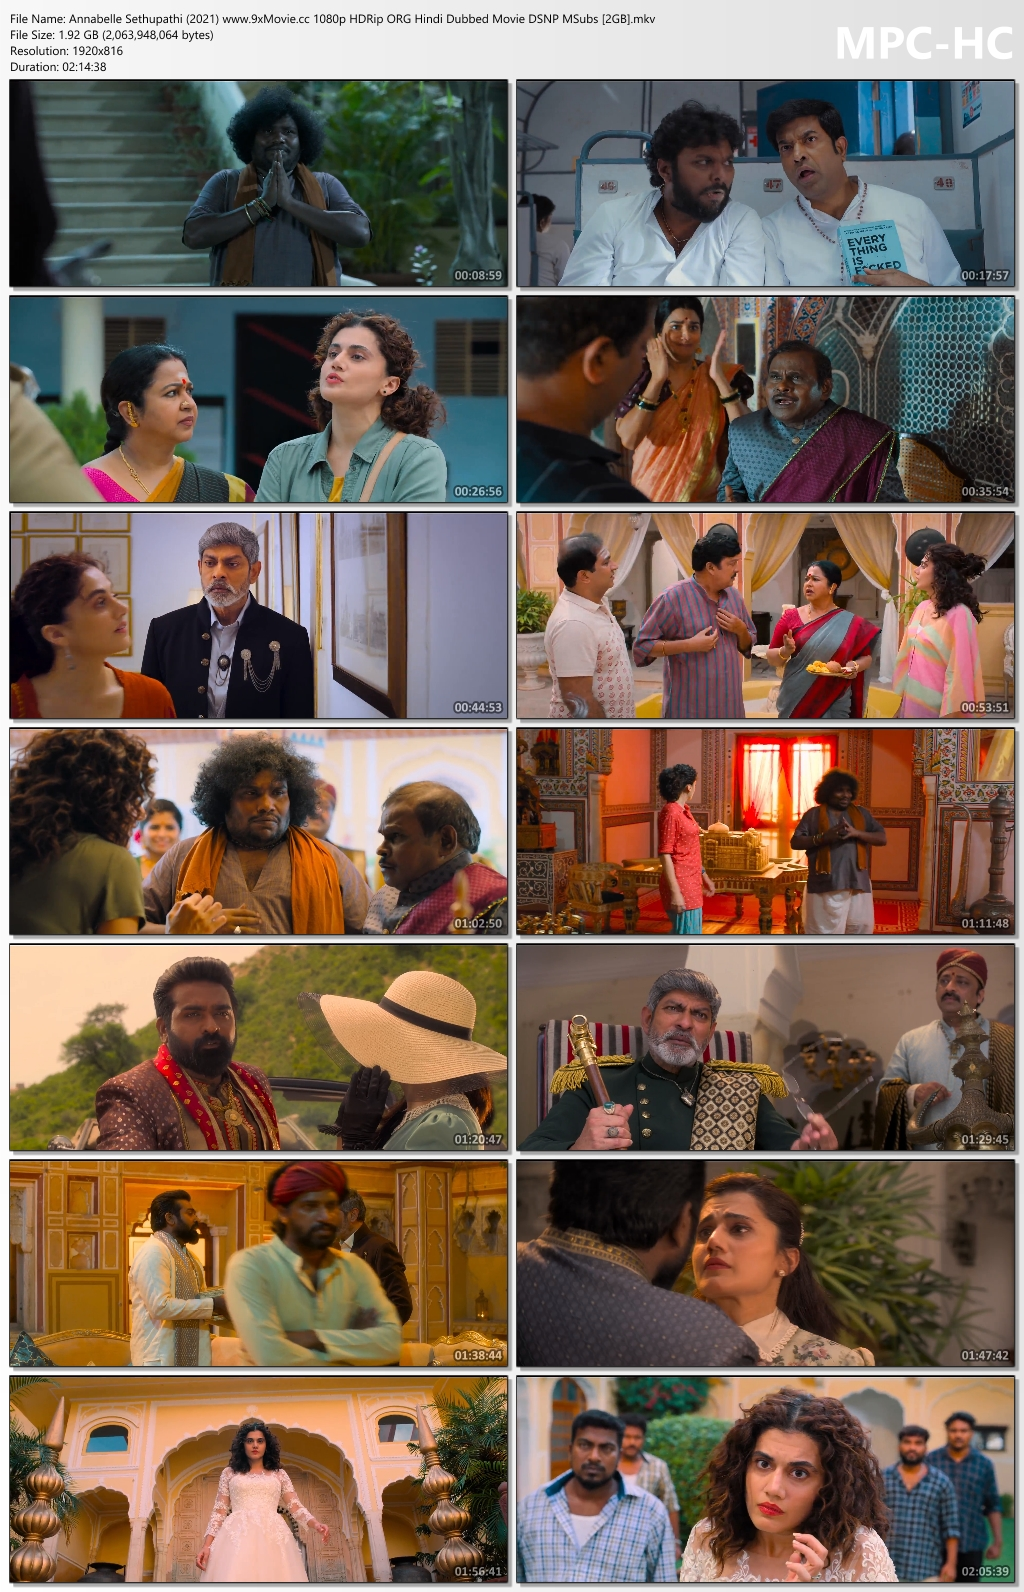 Annabelle-Sethupathi-2021-www-9x-Movie-cc-1080p-HDRip-ORG-Hindi-Dubbed-Movie-DSNP-MSubs-2-GB-mkv